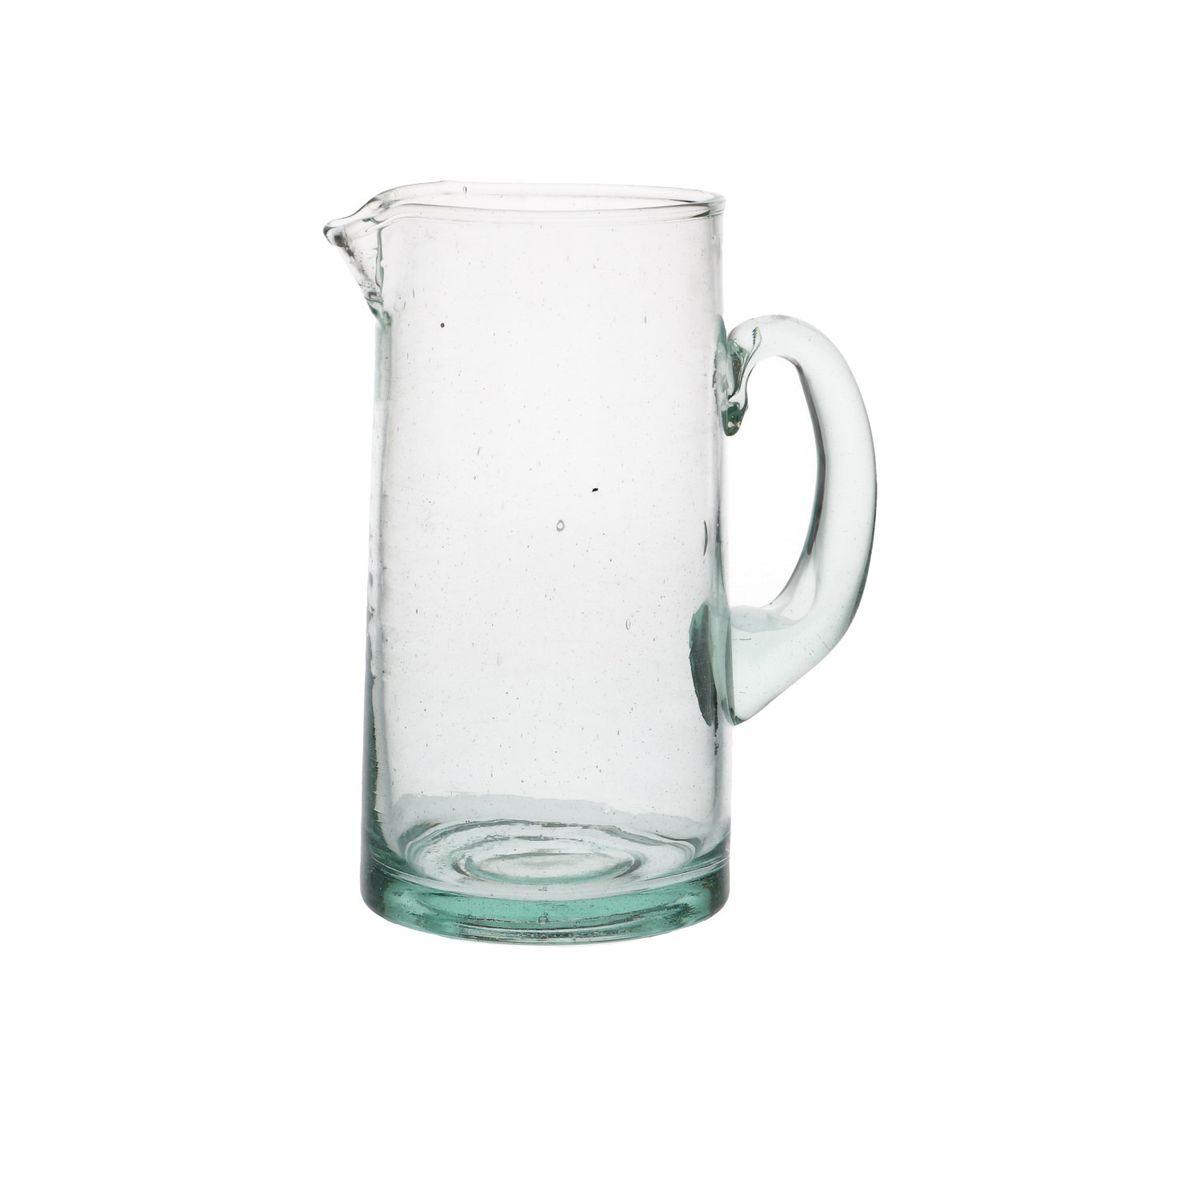 Karaf, groen glas, recht